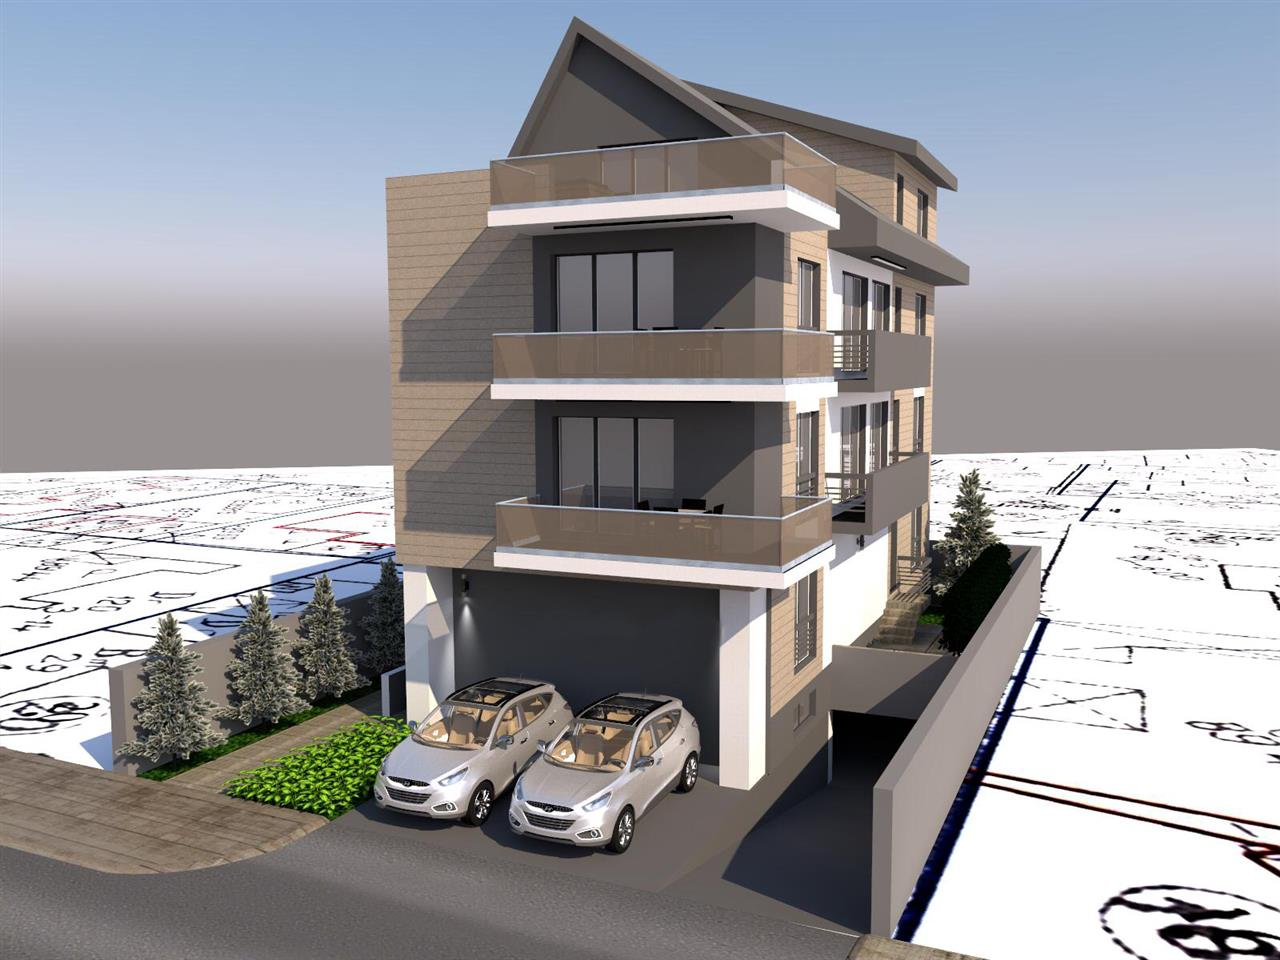 Vanzare Apartament 4 Camere Parter Comision 0 %